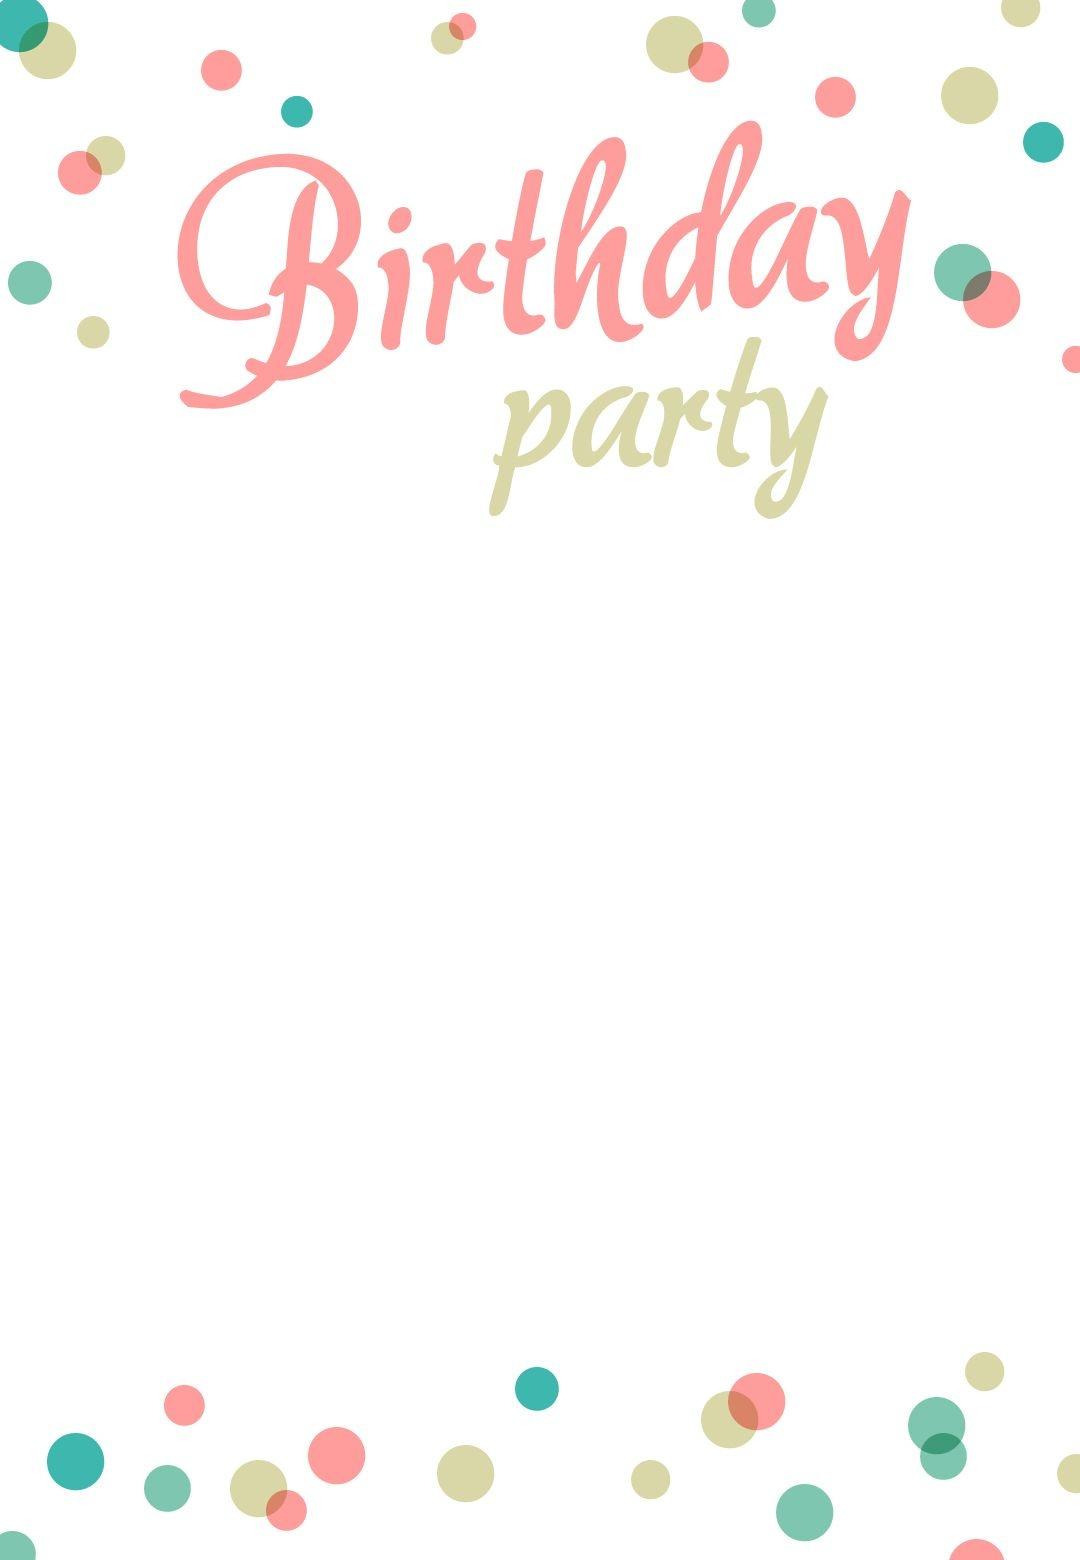 Birthday Party Dots - Free Printable Birthday Invitation Template - Free Printable Birthday Invitations